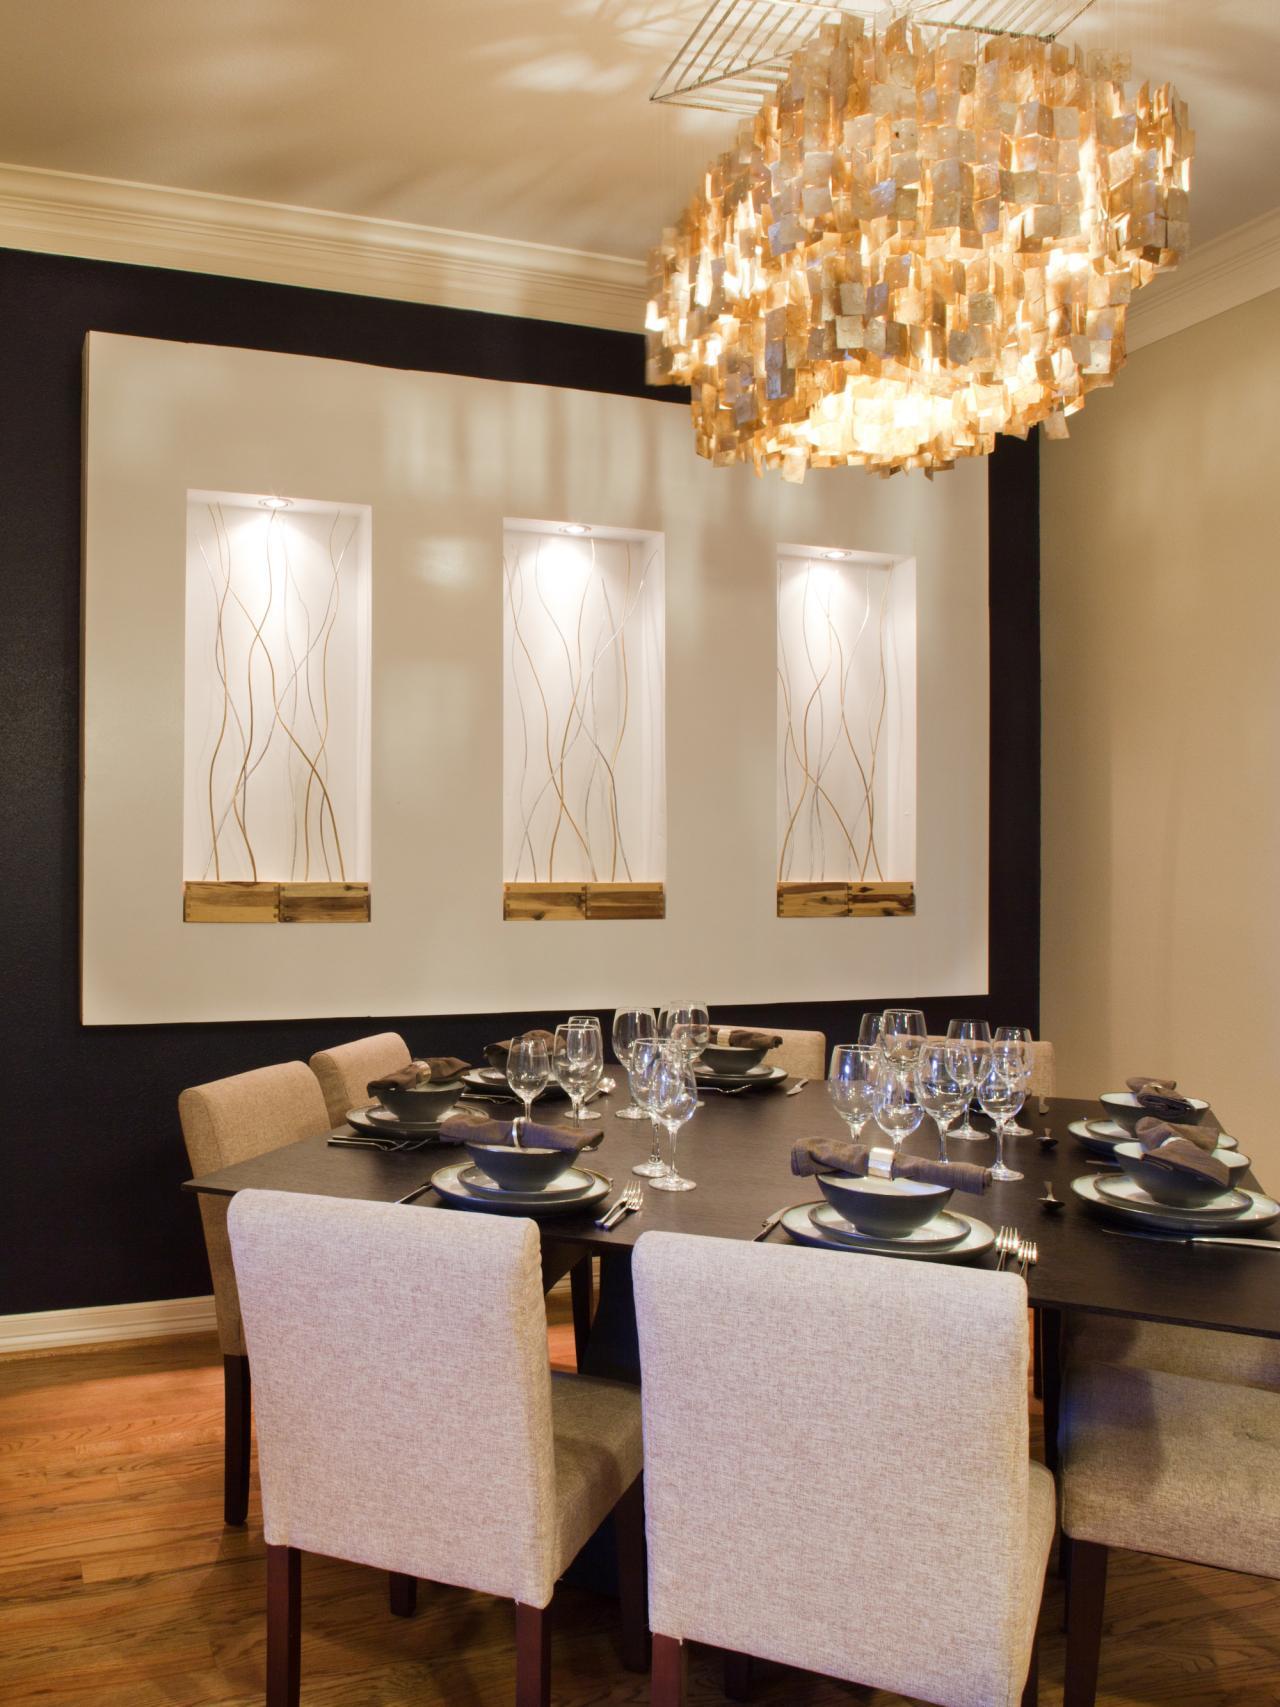 25 Rustic Dining Room Design Ideas - Decoration Love on Decor Room  id=85788